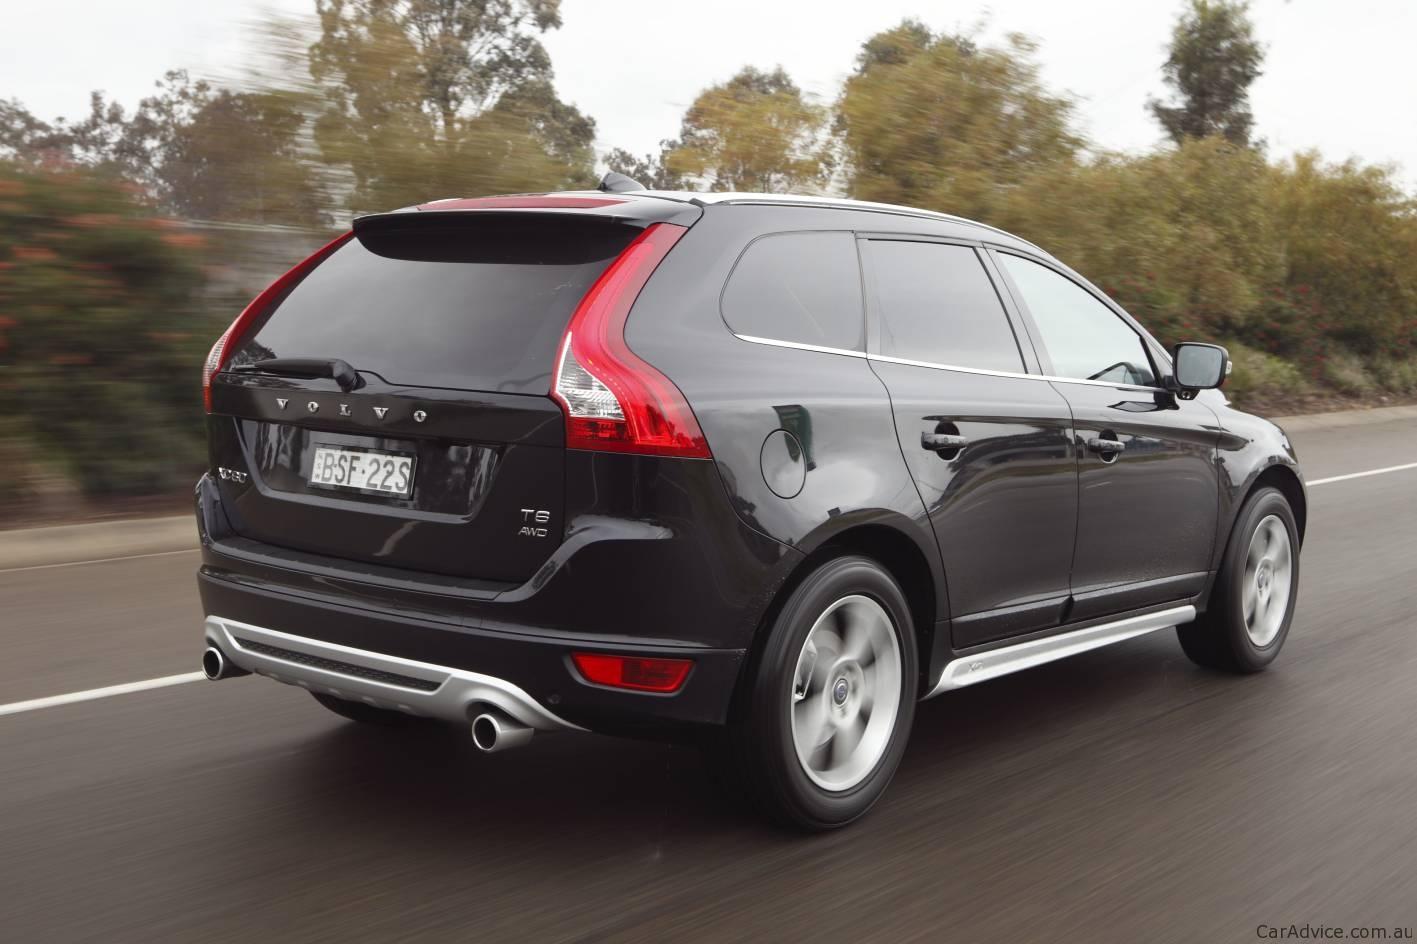 2012 Volvo Xc60 Update On Sale In Australia Photos